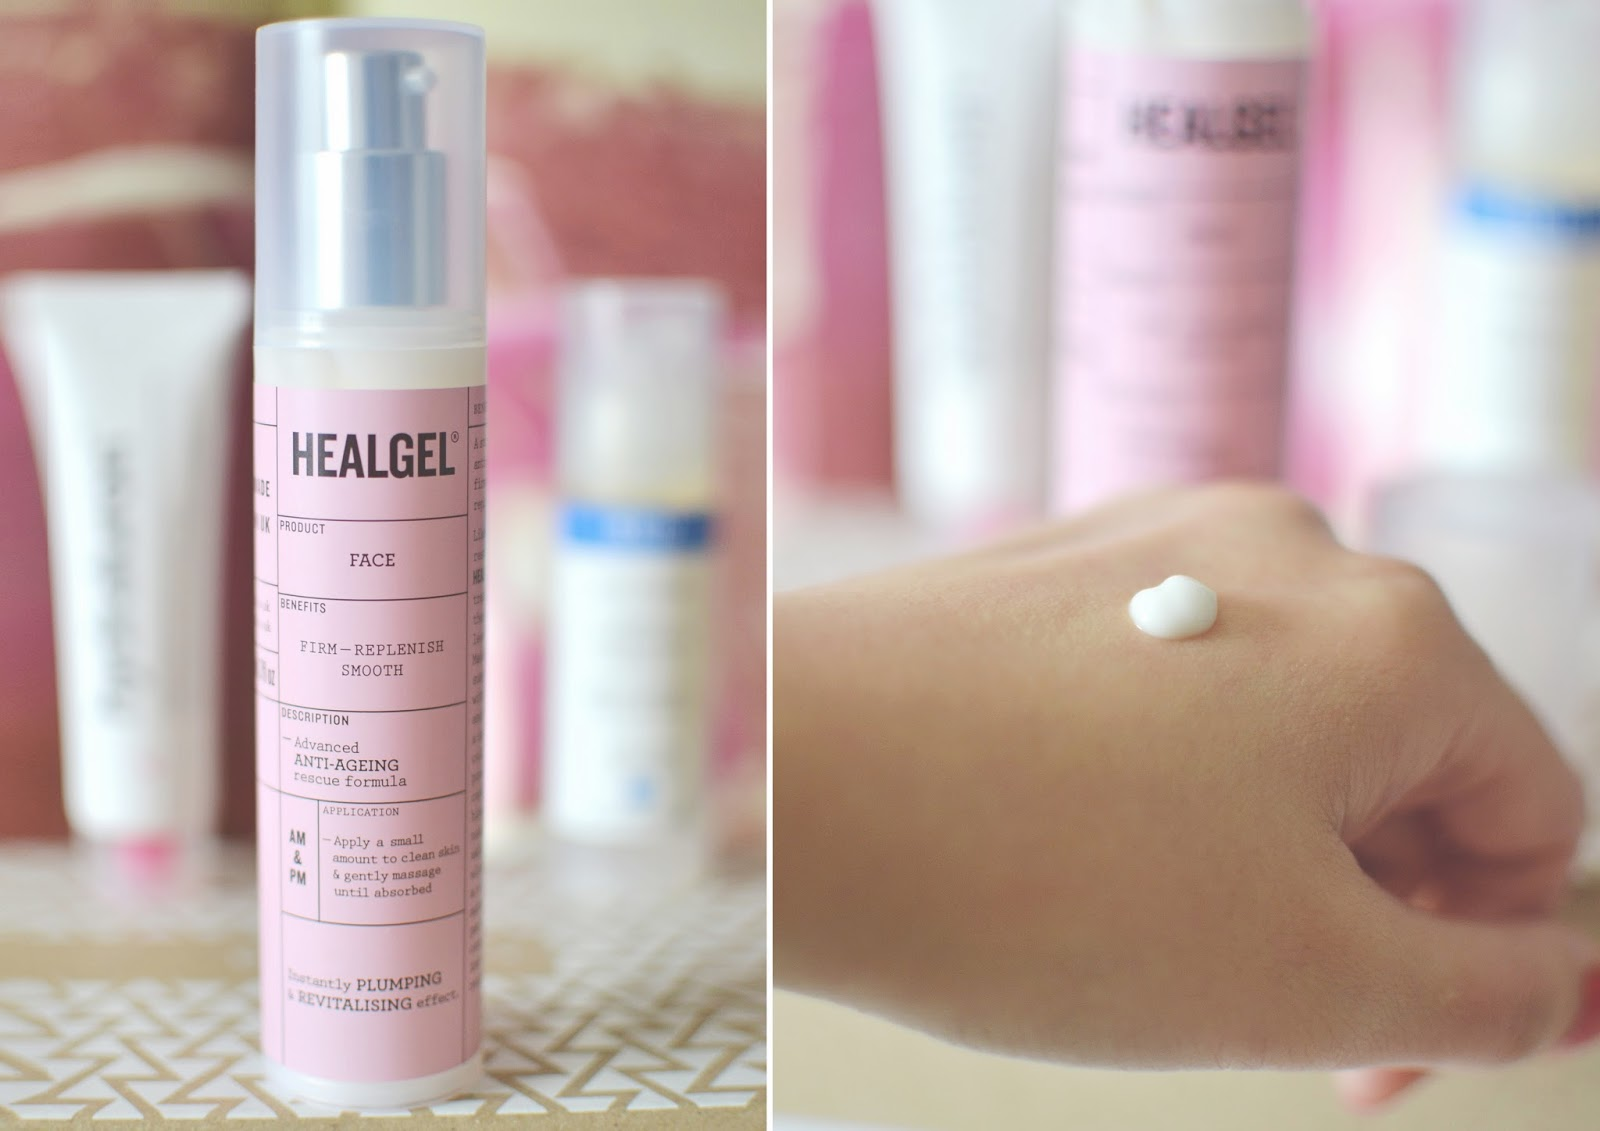 heal gel face review